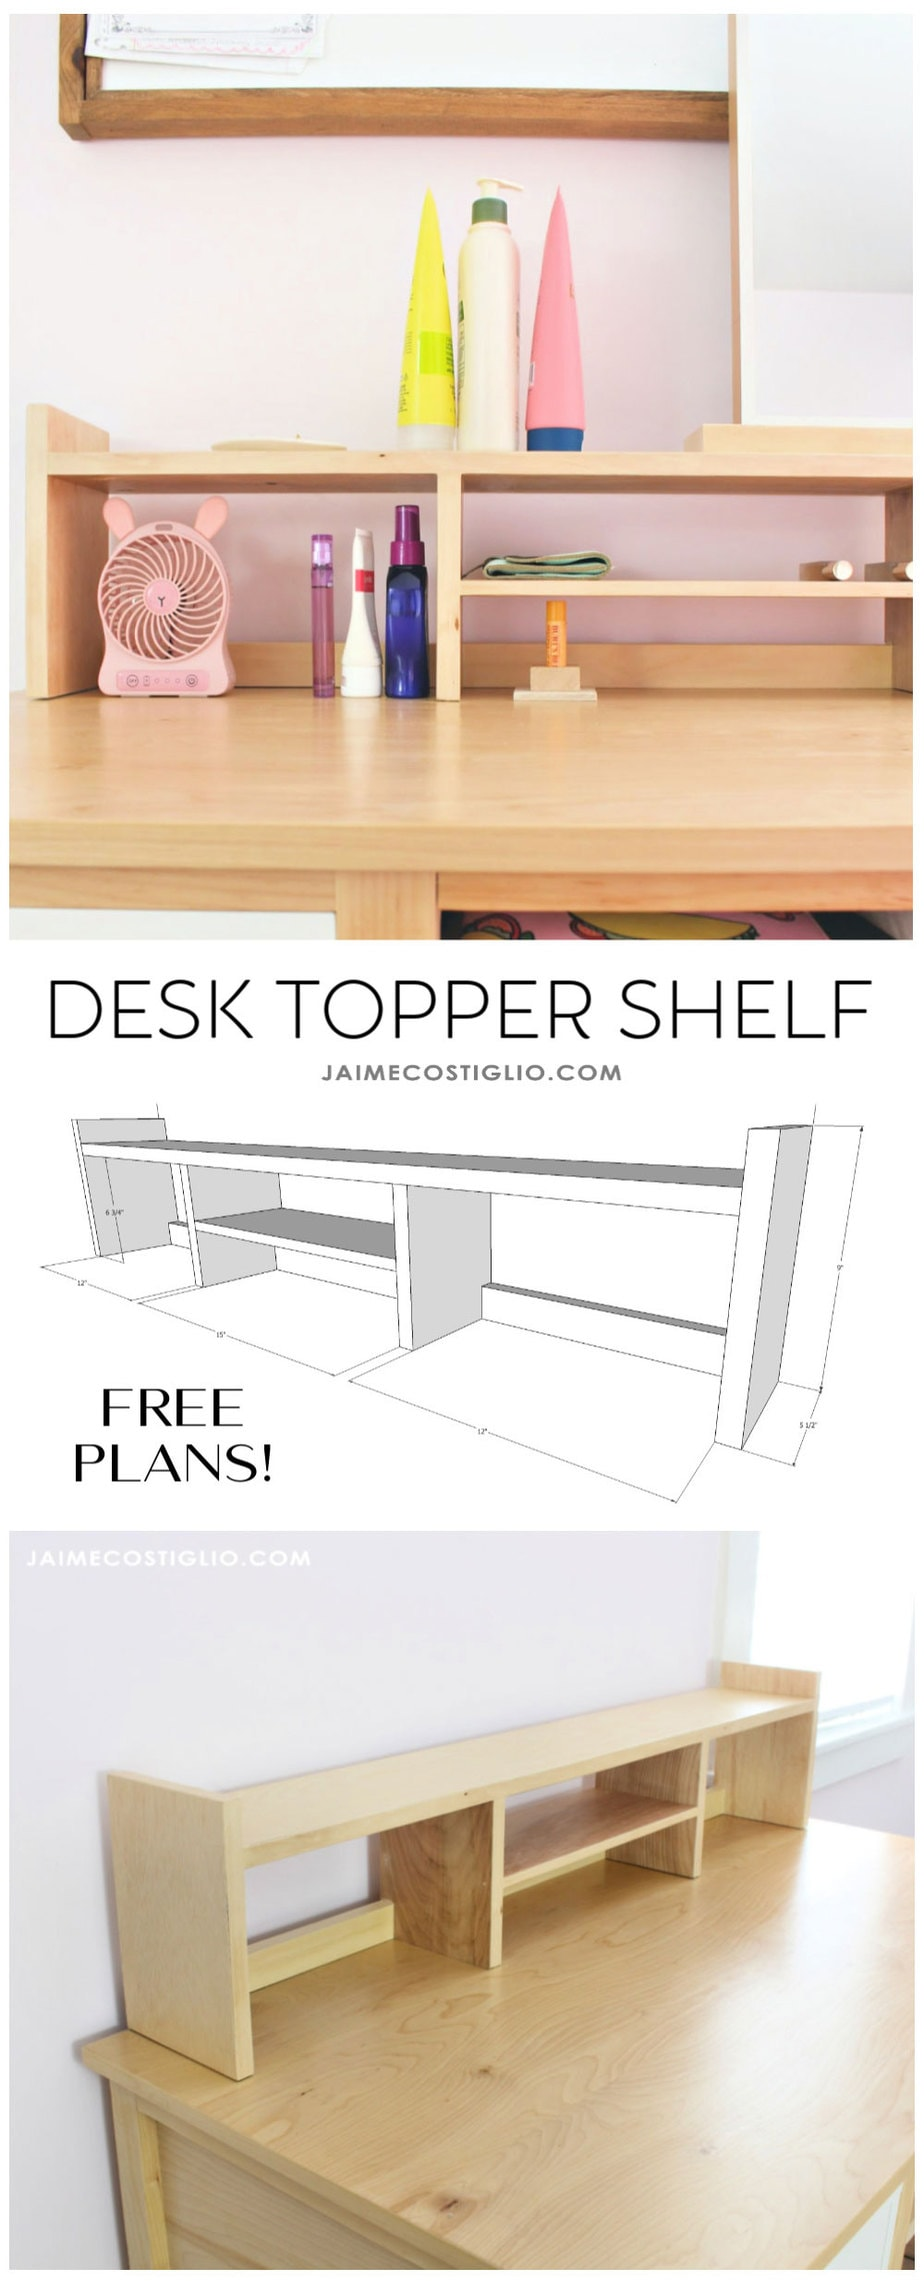 desk topper shelf free plans